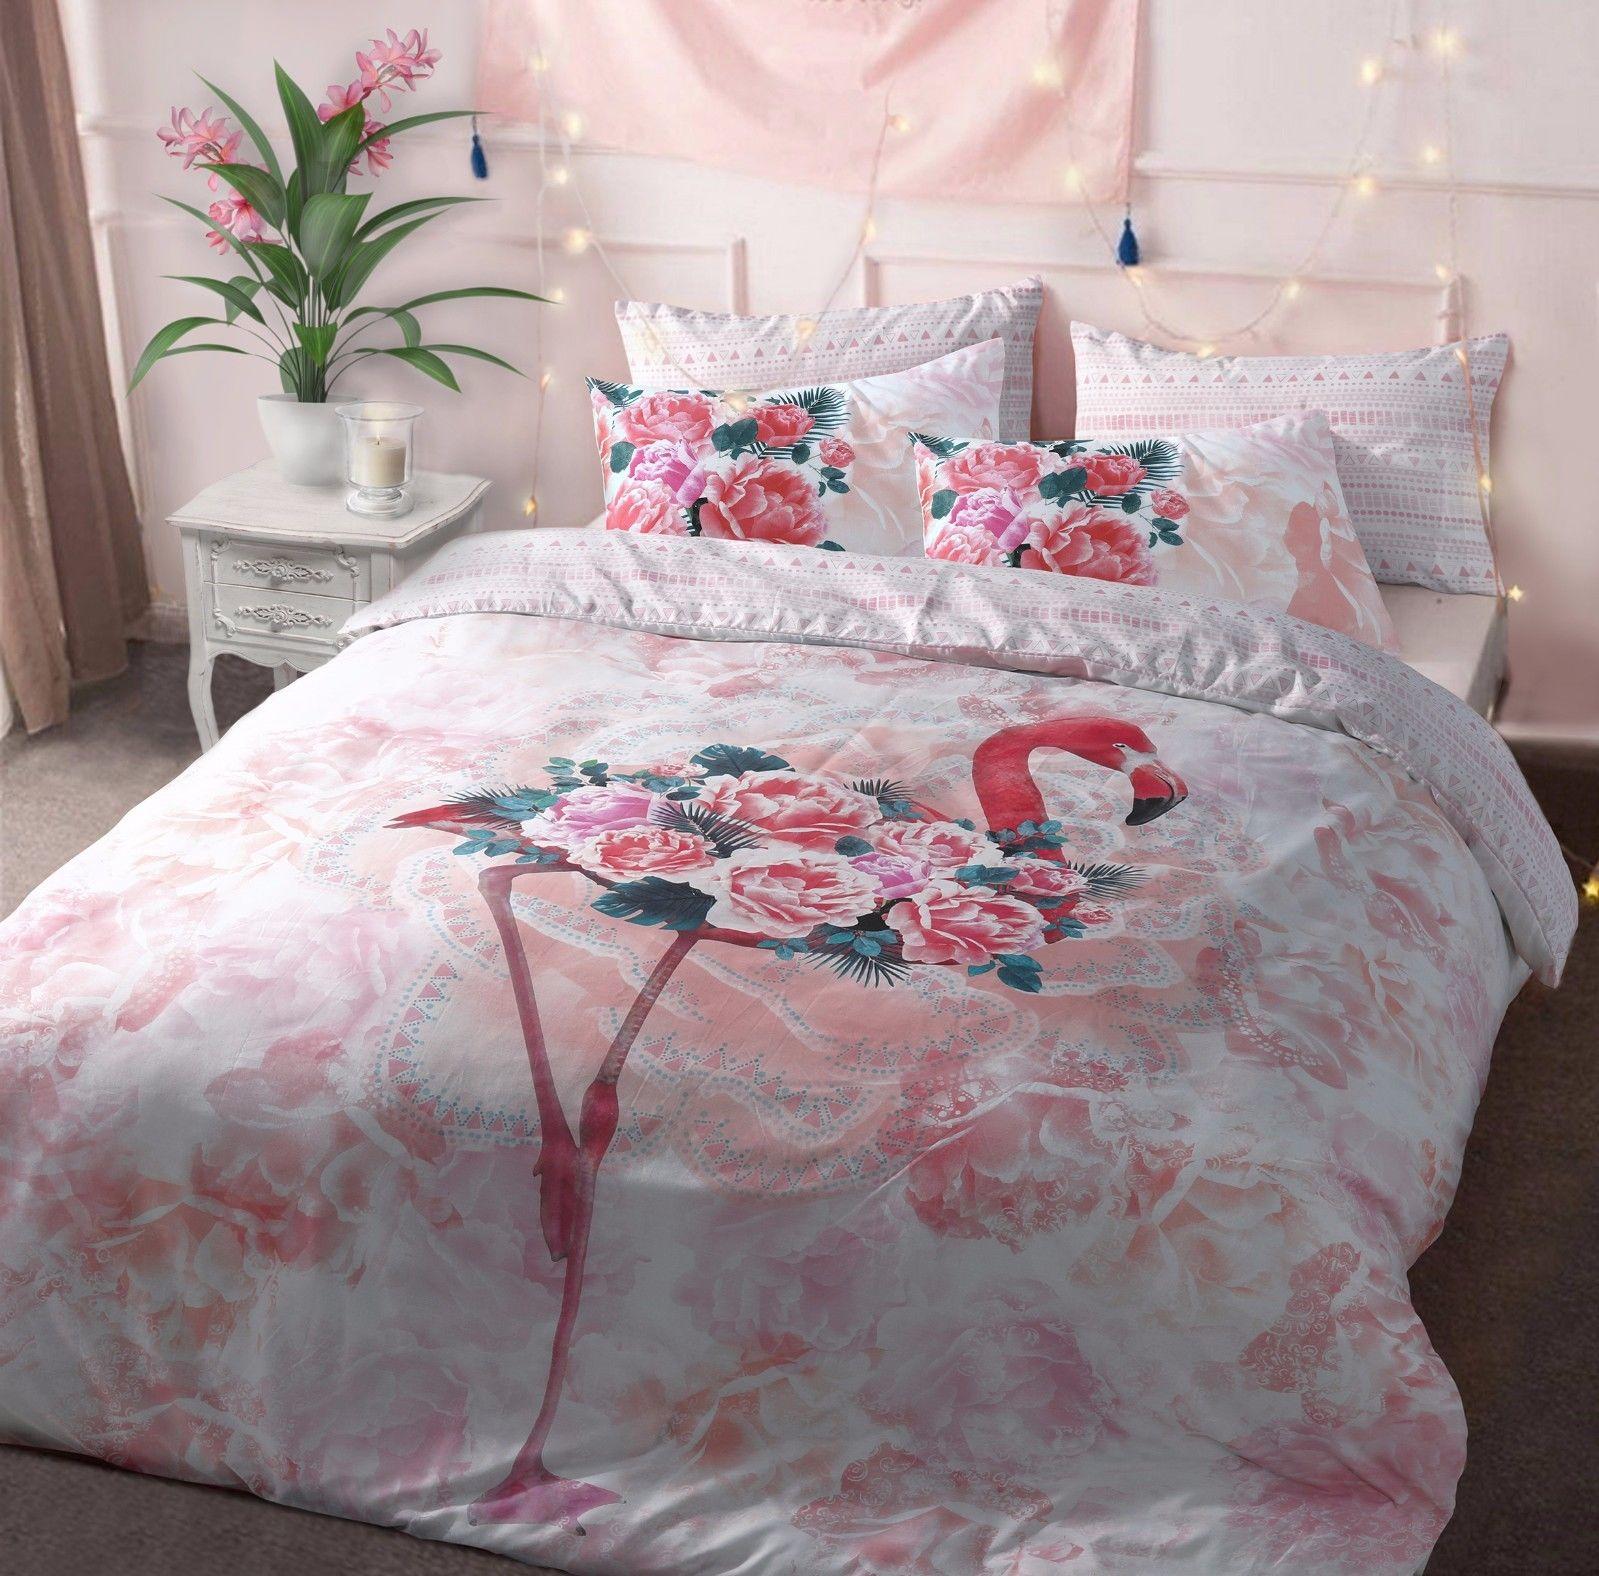 Bed Linens & Sets Flamingo Duvet Cover Set With Pillowcases Pink Reversible Polycotton Bedding Set